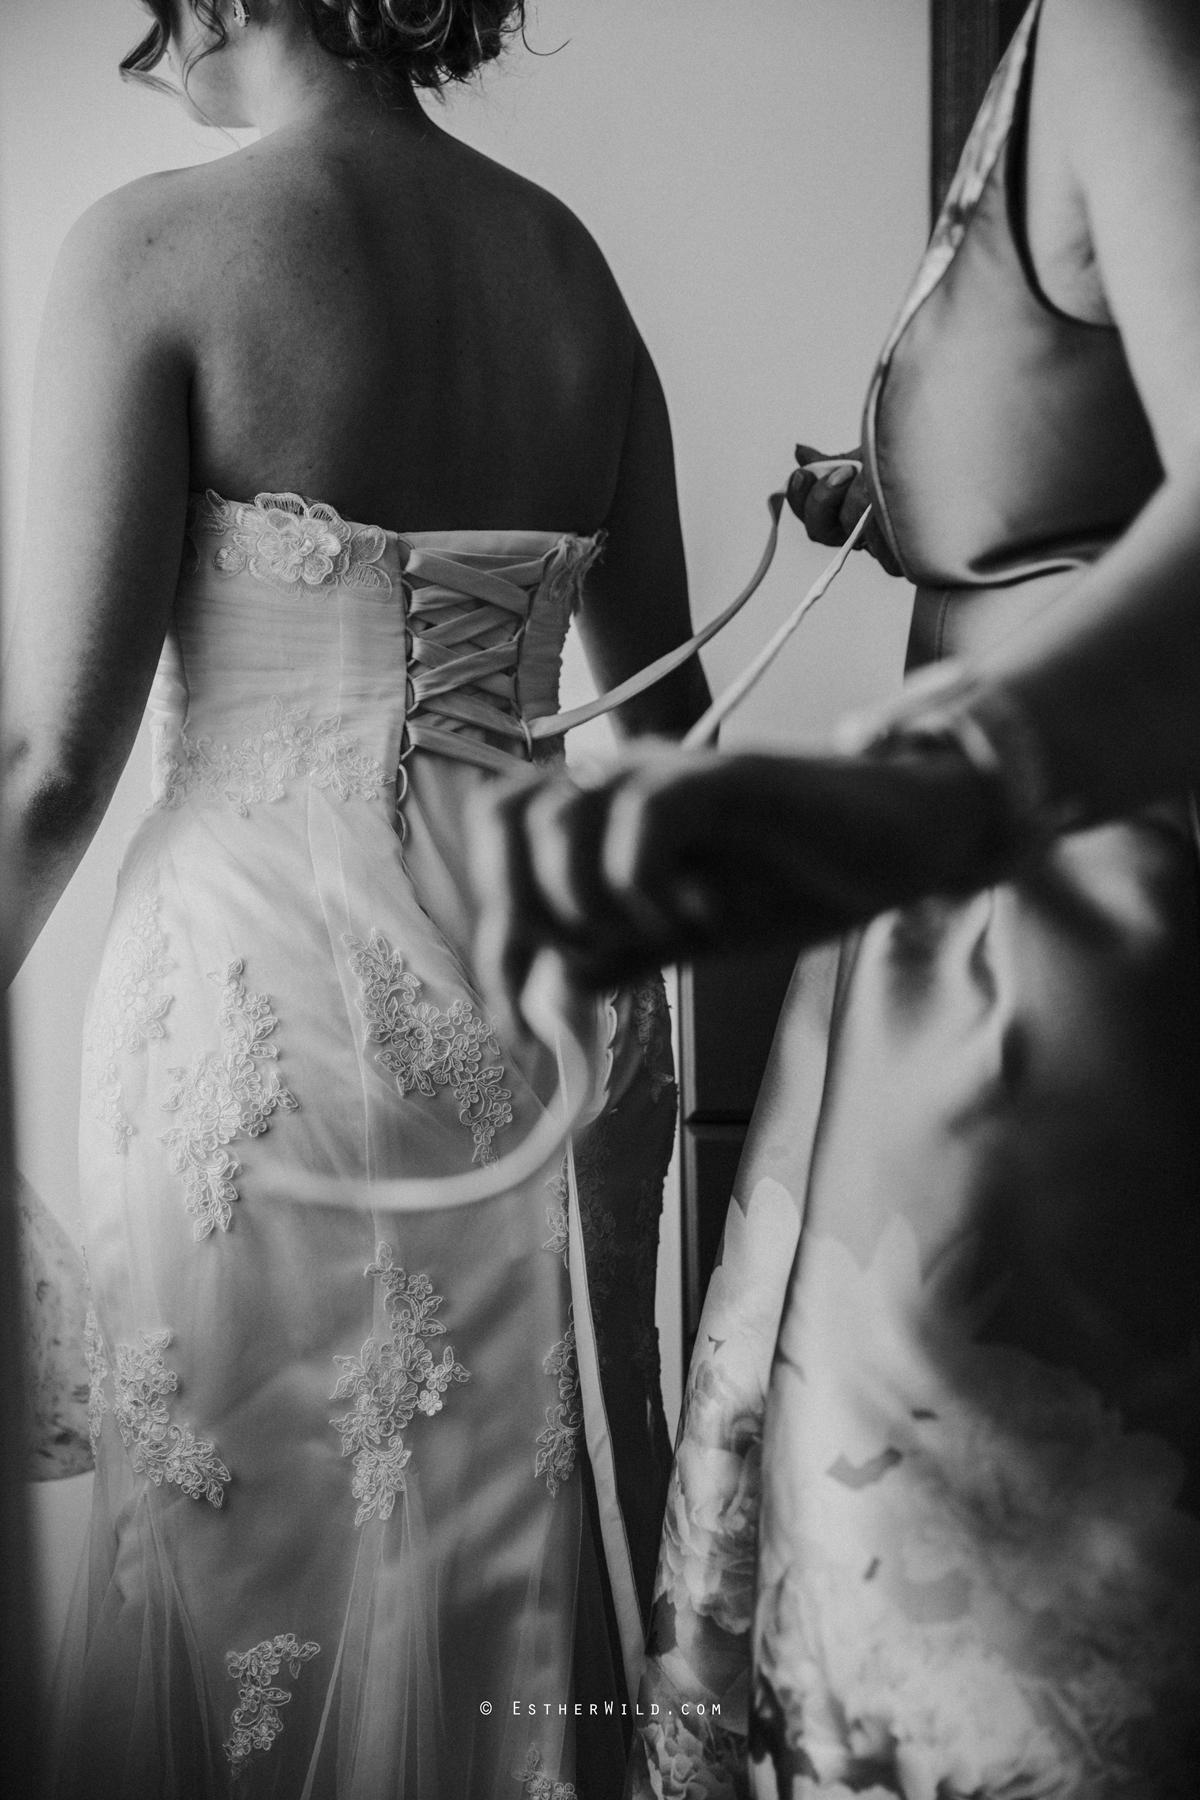 Glebe_Farm_Barn_Rustic_Norfolk_Wedding_Esther_Wild_Photographer_Copyright_IMG_0316.jpg